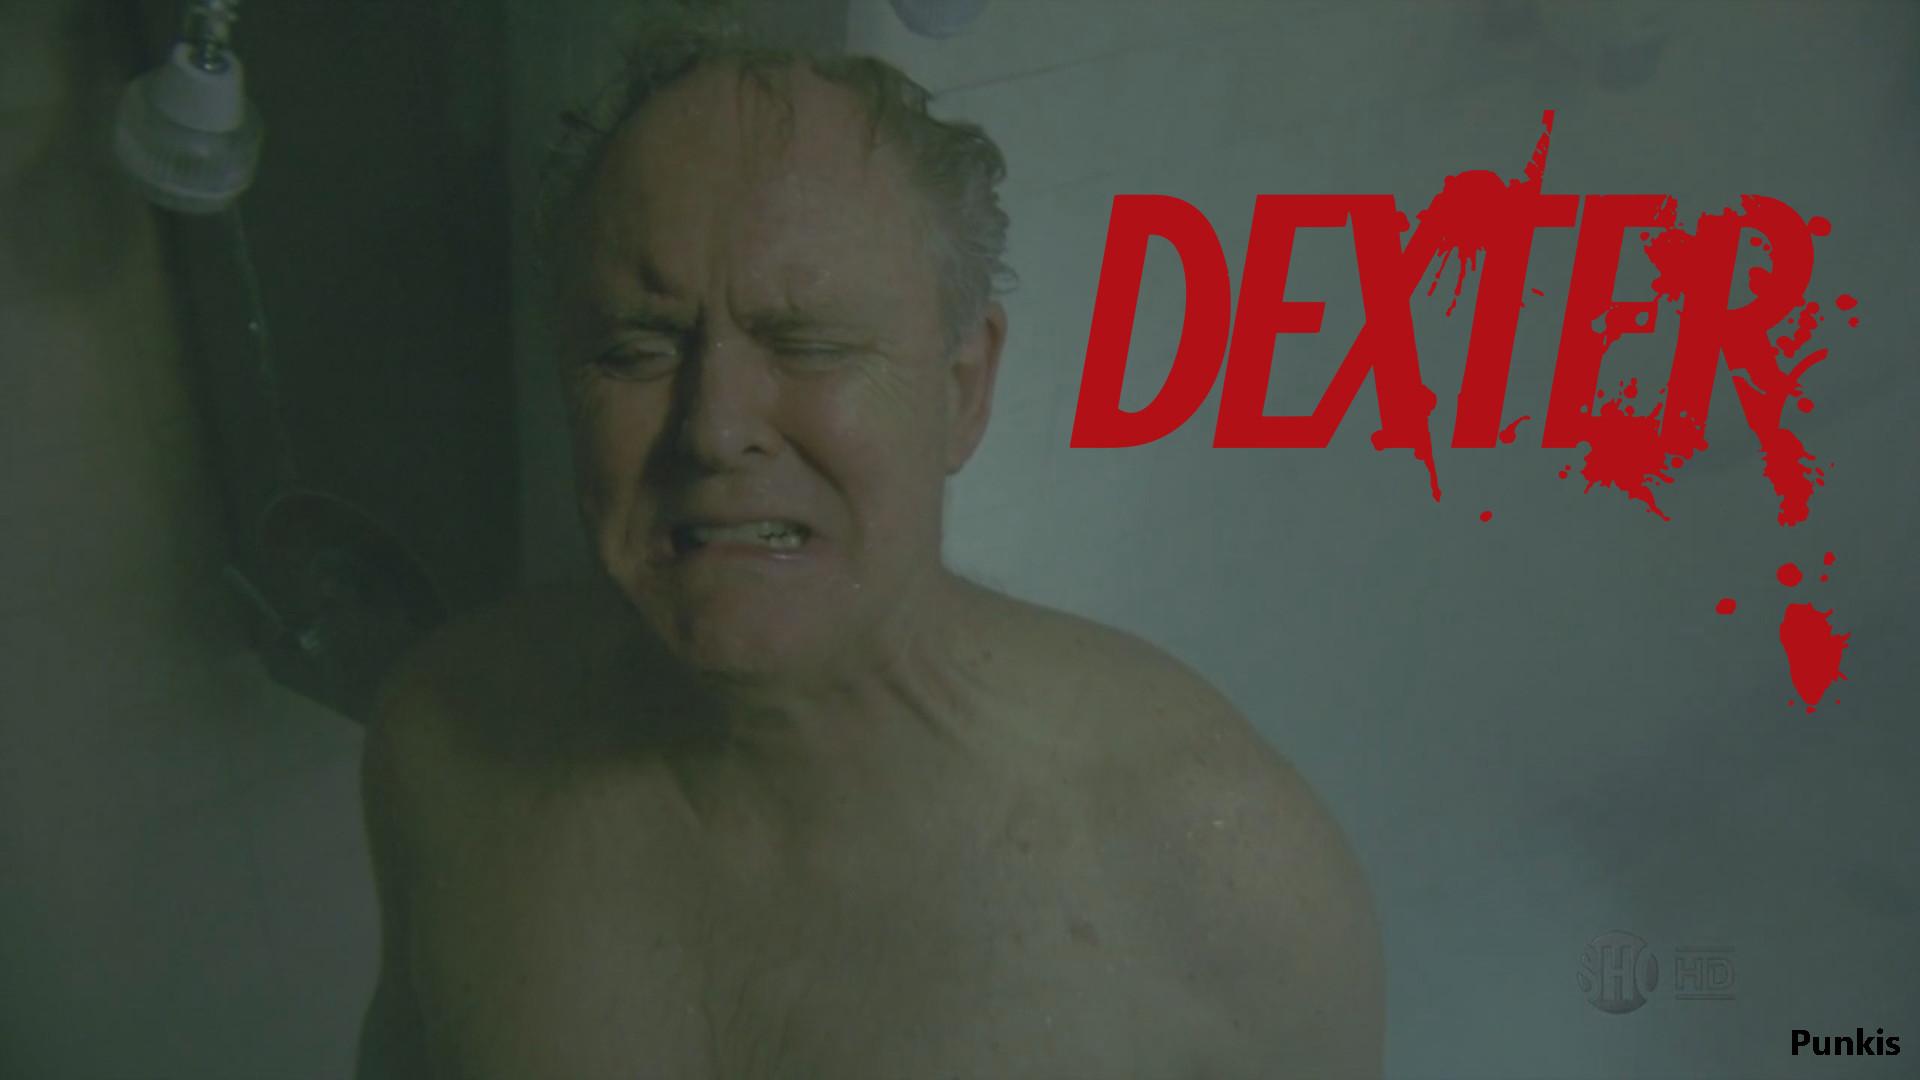 … Dexter – Trinity Killer HD Wallpaper (1080p) by ThePunkis23